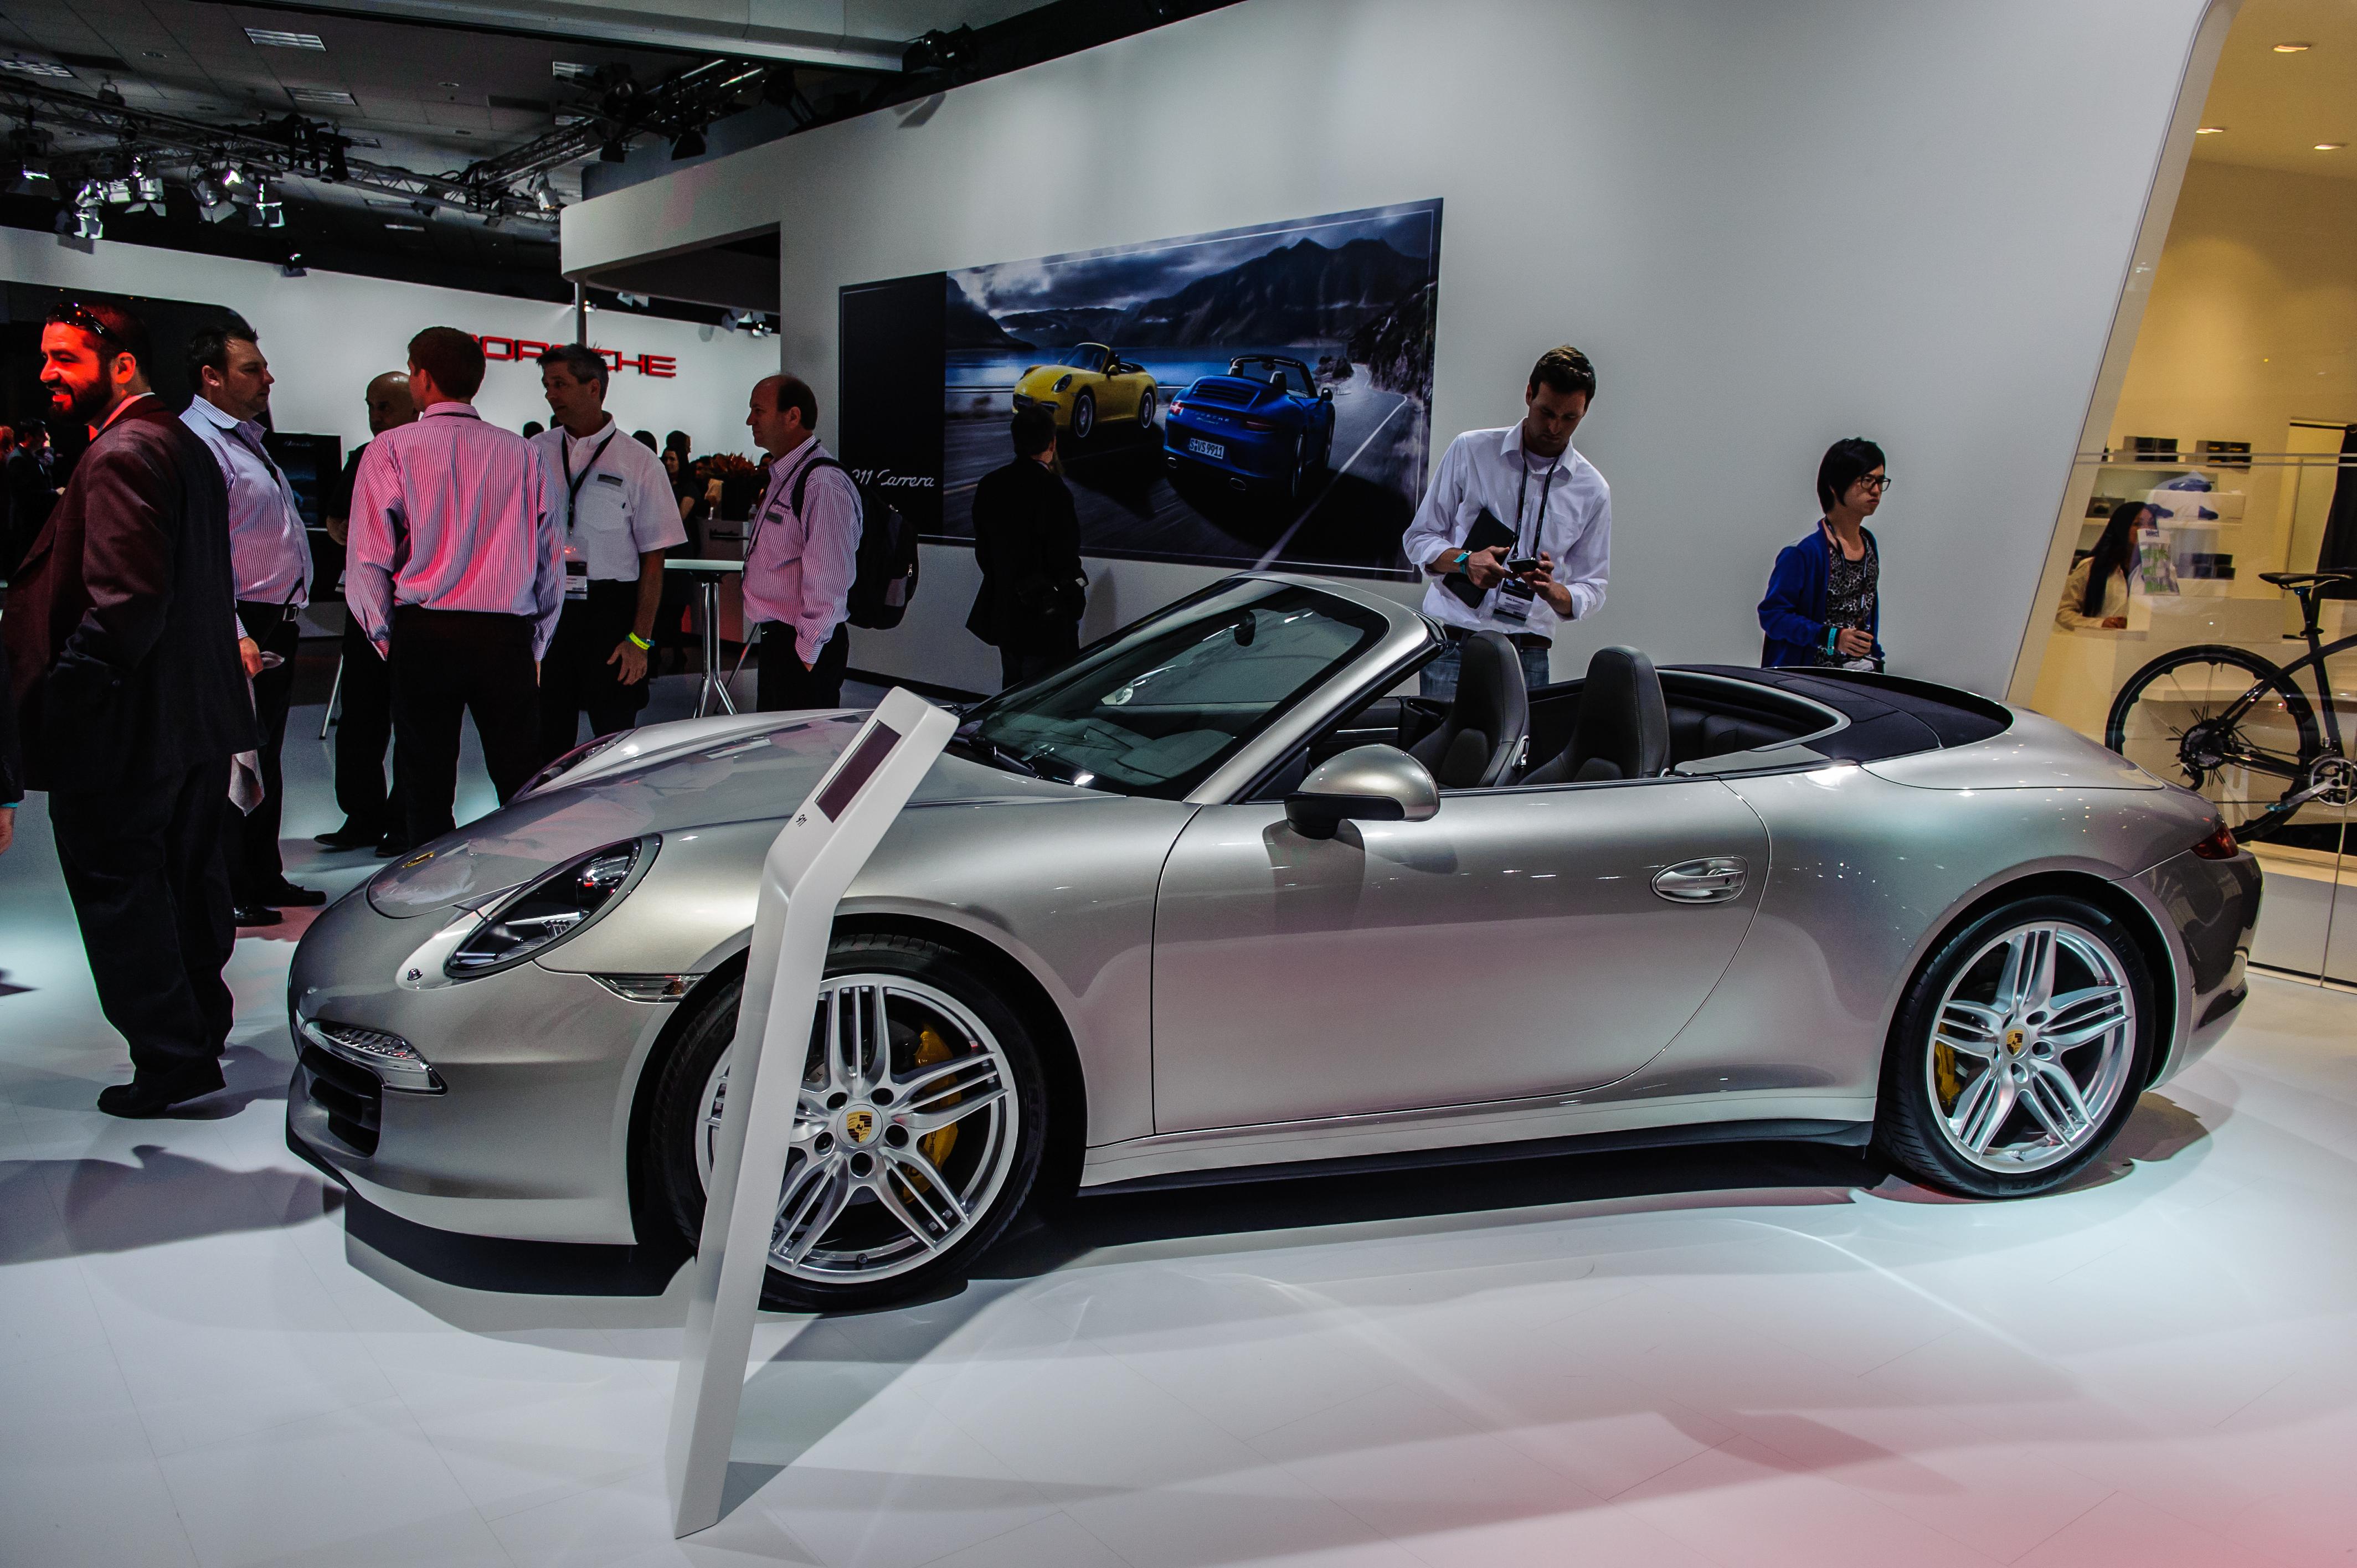 2012 Porsche 911 Carrera 4S at 2012 L.A. Auto Show by lexster05